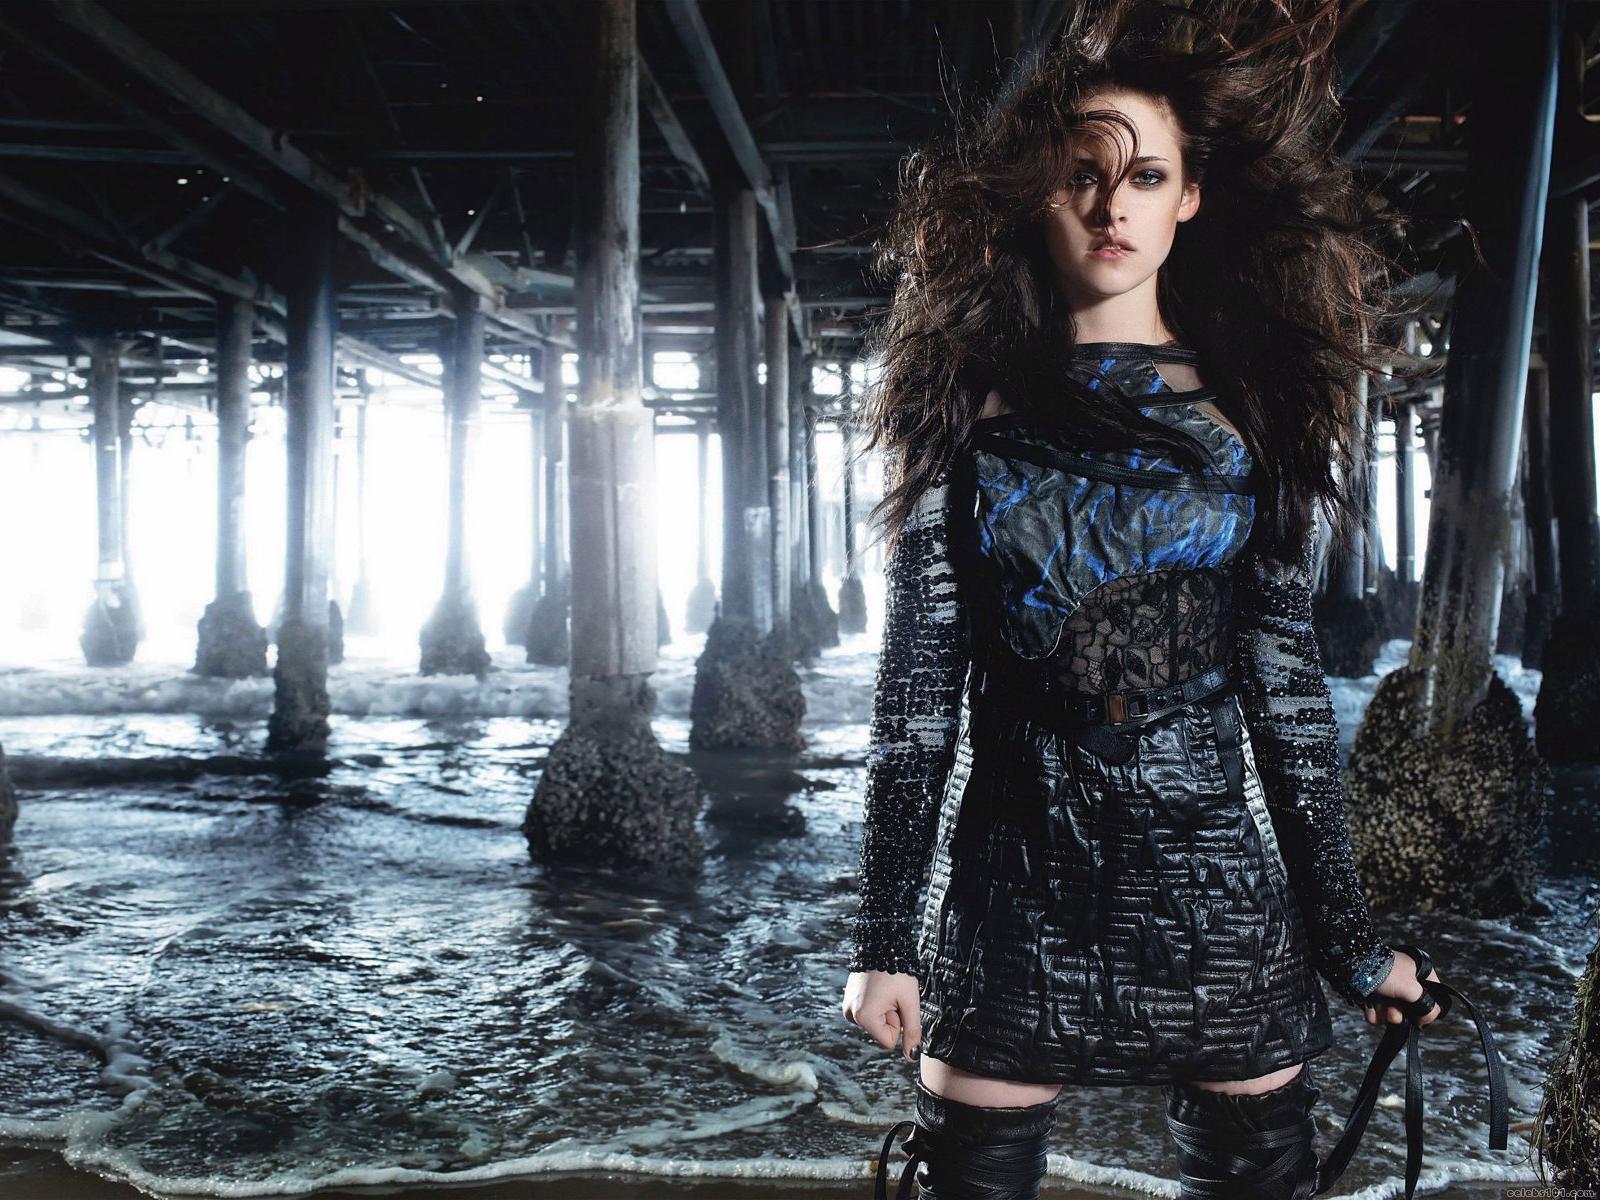 http://2.bp.blogspot.com/-hiXopgFc5bI/T8soumO0MaI/AAAAAAAAALc/8PGpG3Lp4Ds/s1600/Kristen+Stewart+HQ+Wallpapers+(1).jpg